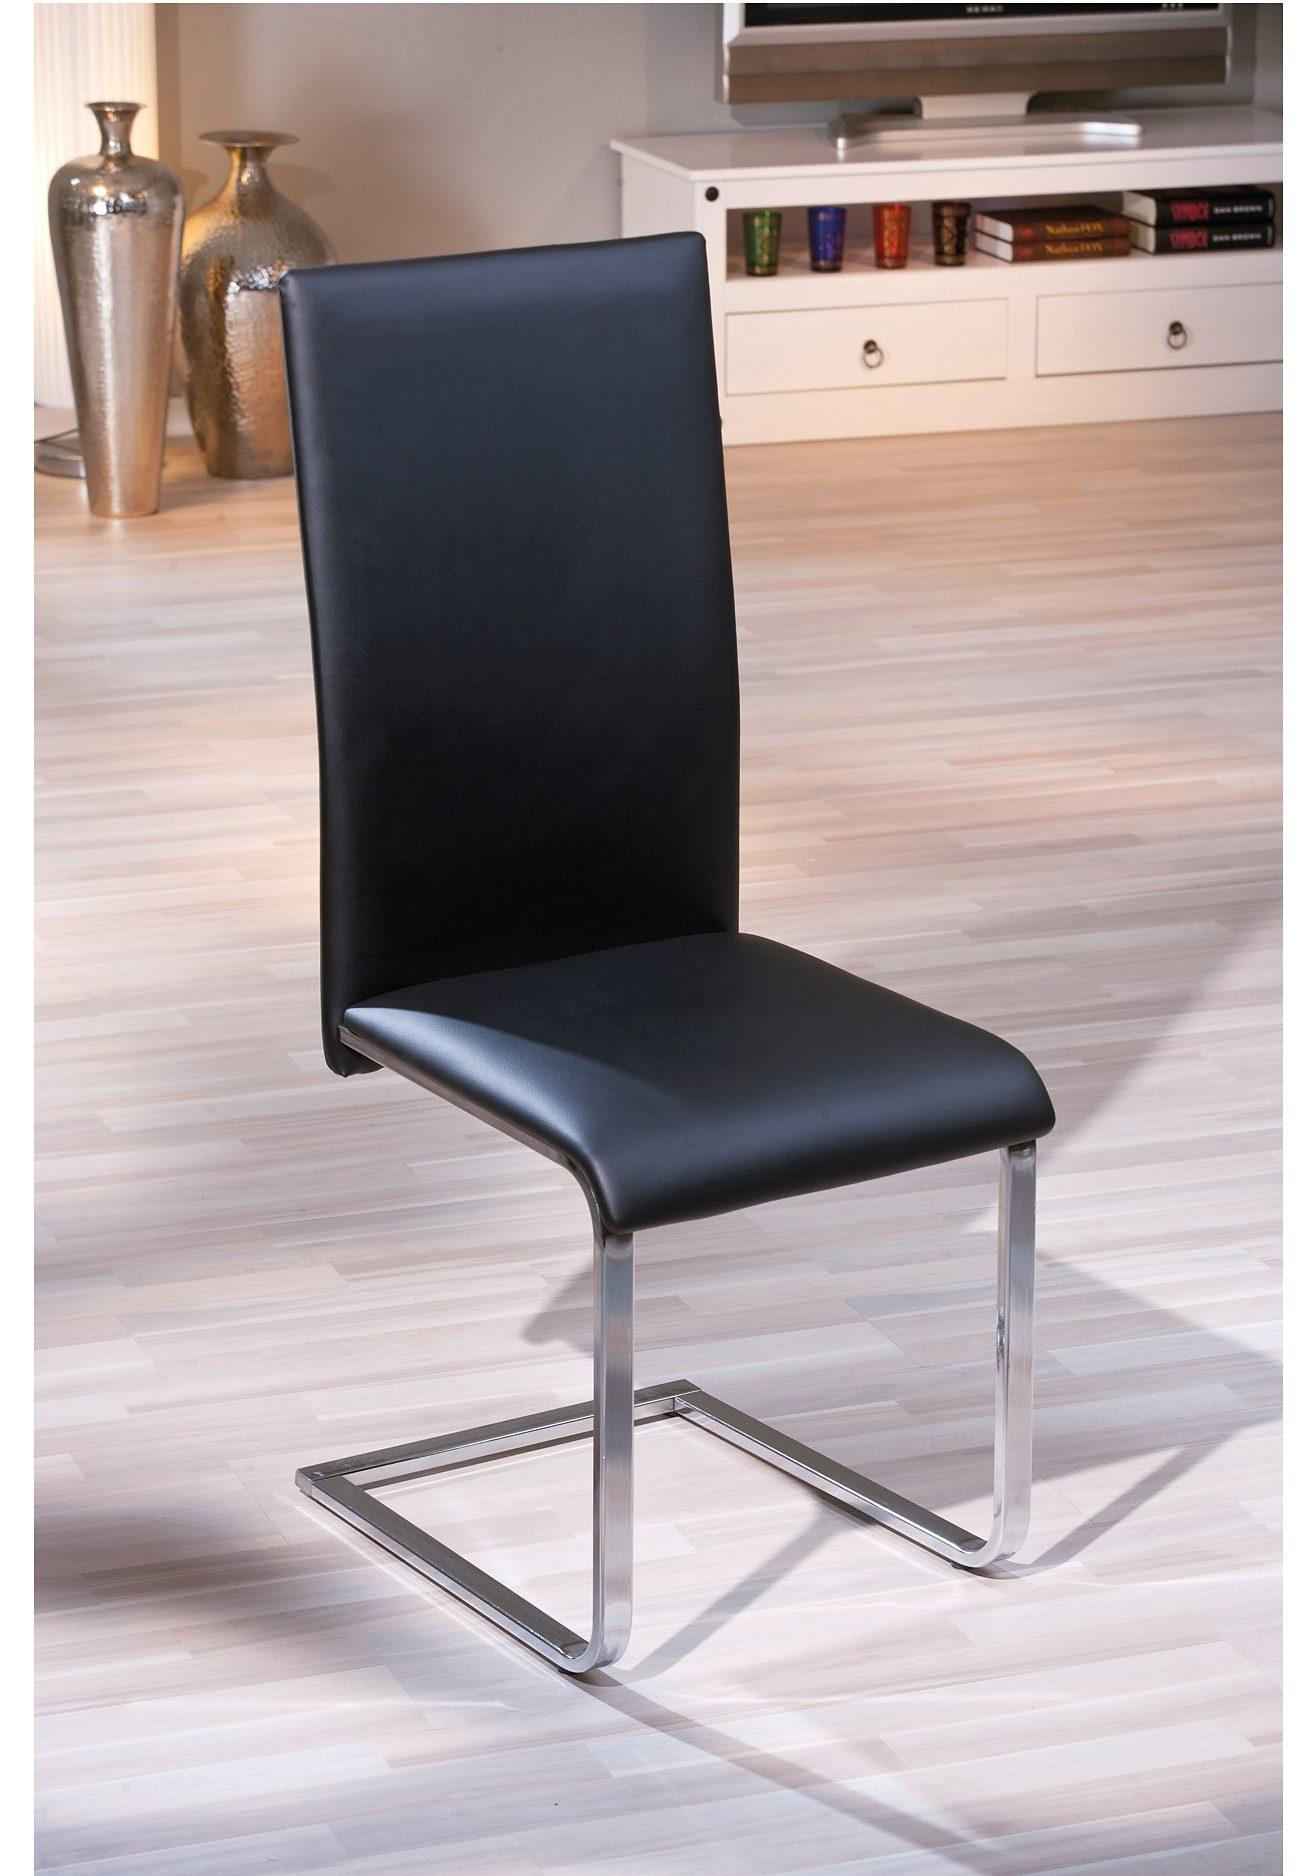 Stühle (1 Stck.)